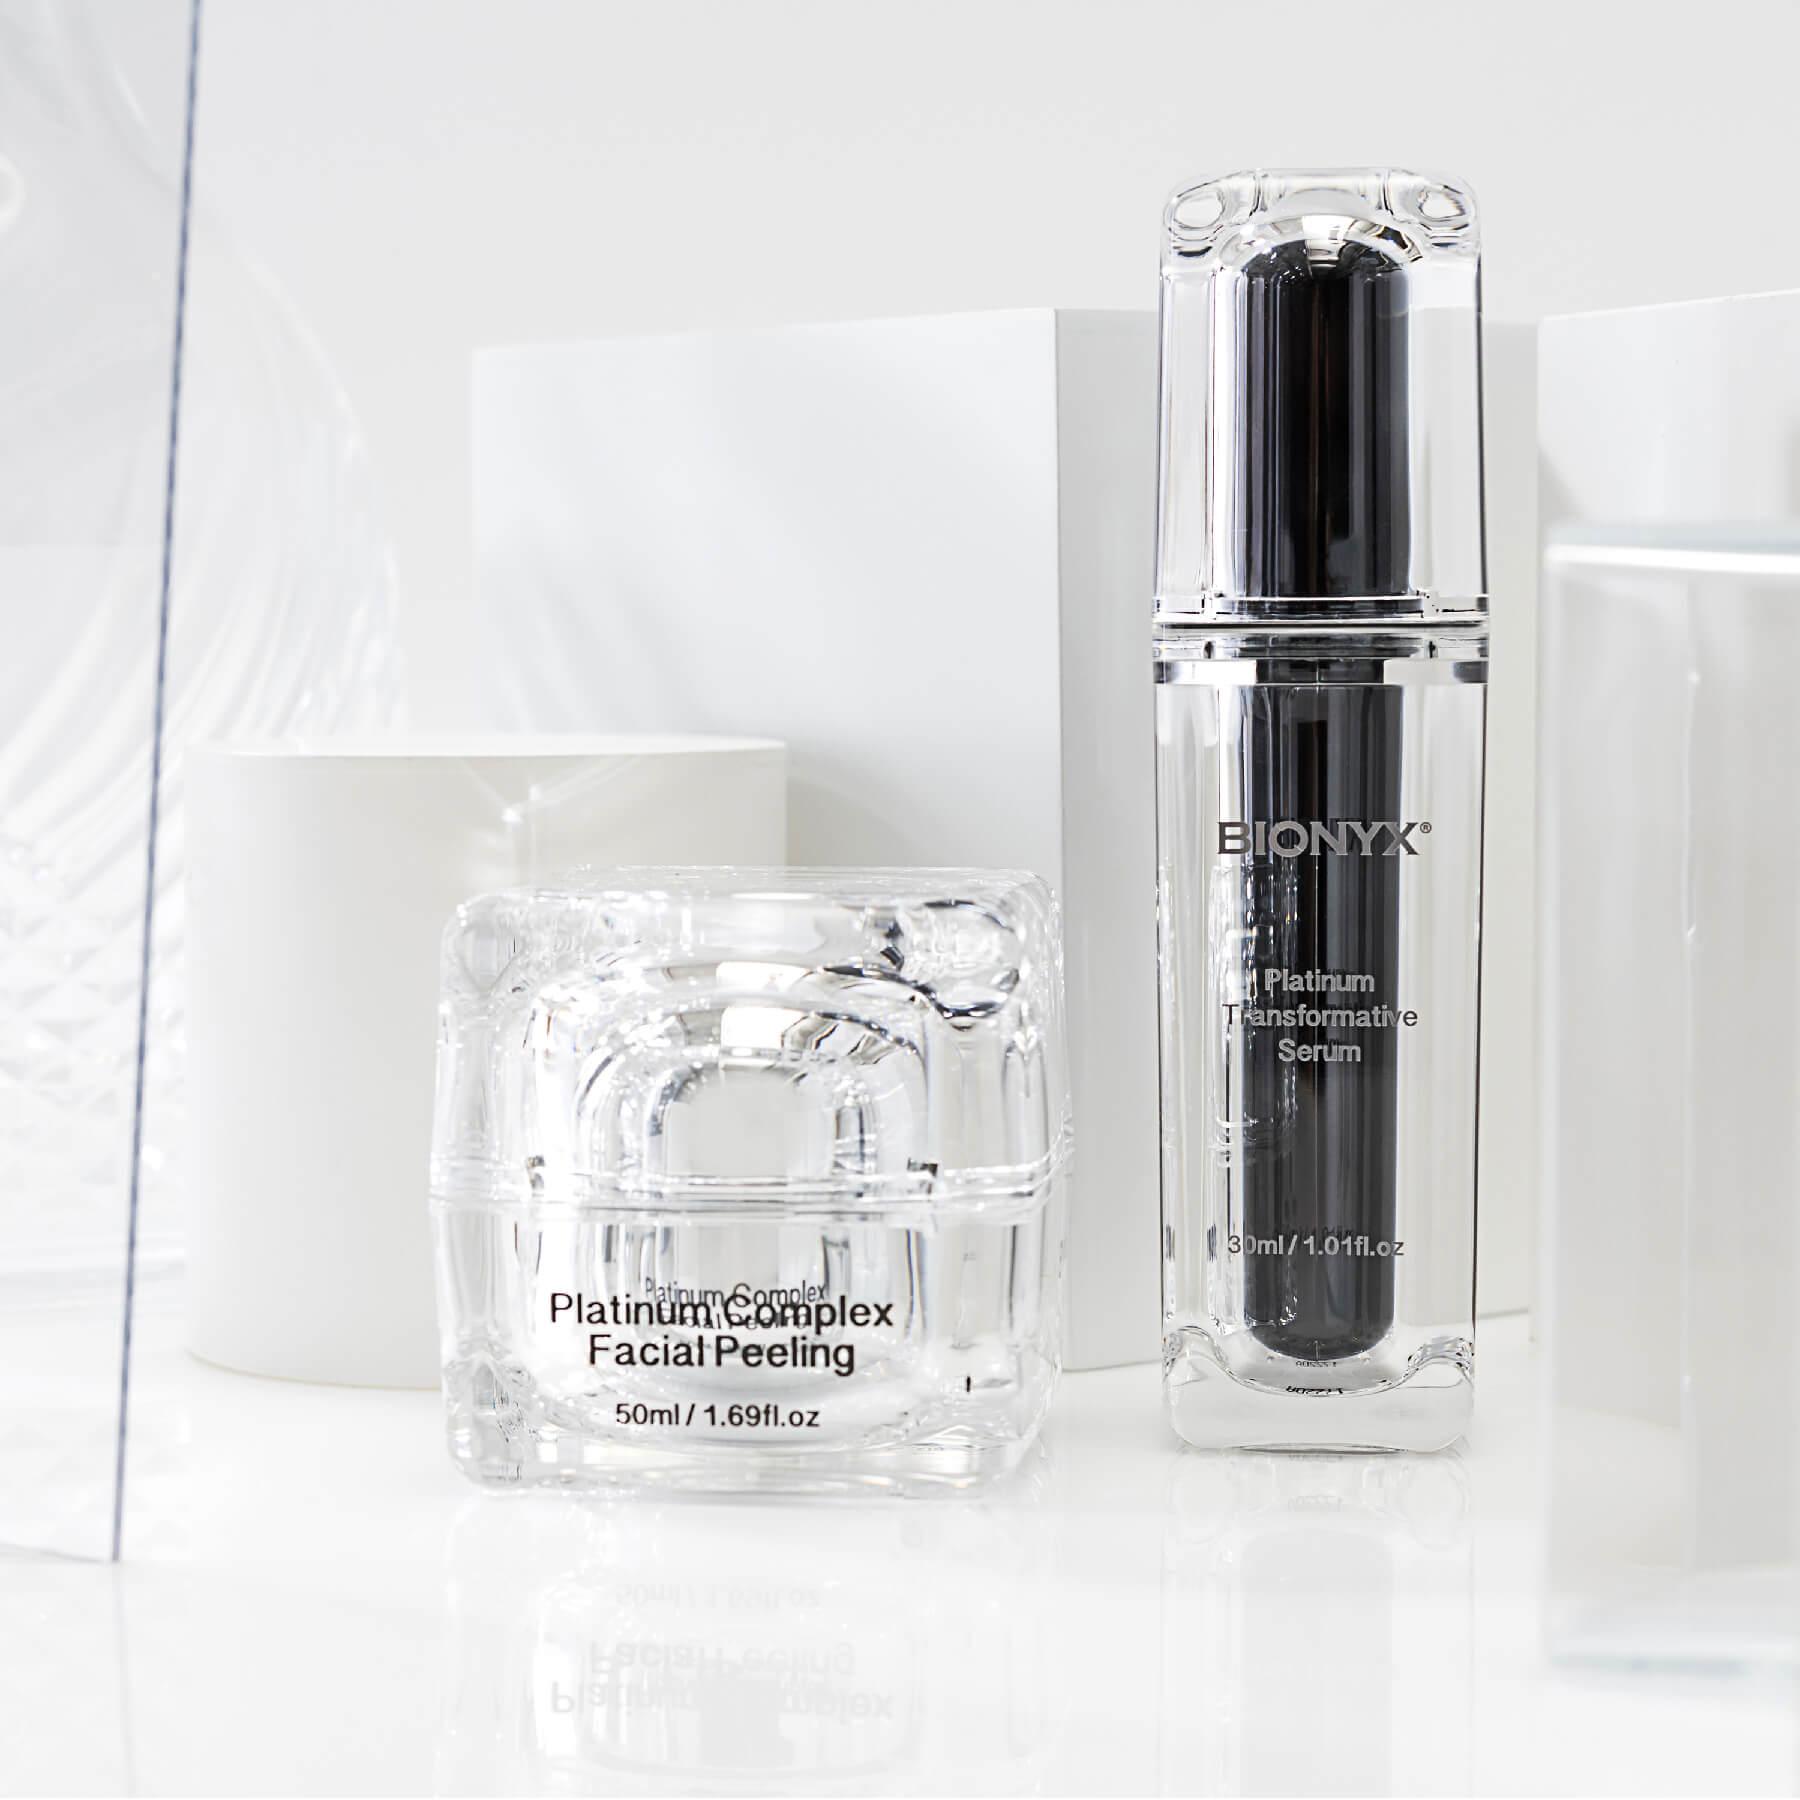 Bionyx platinum skincare products